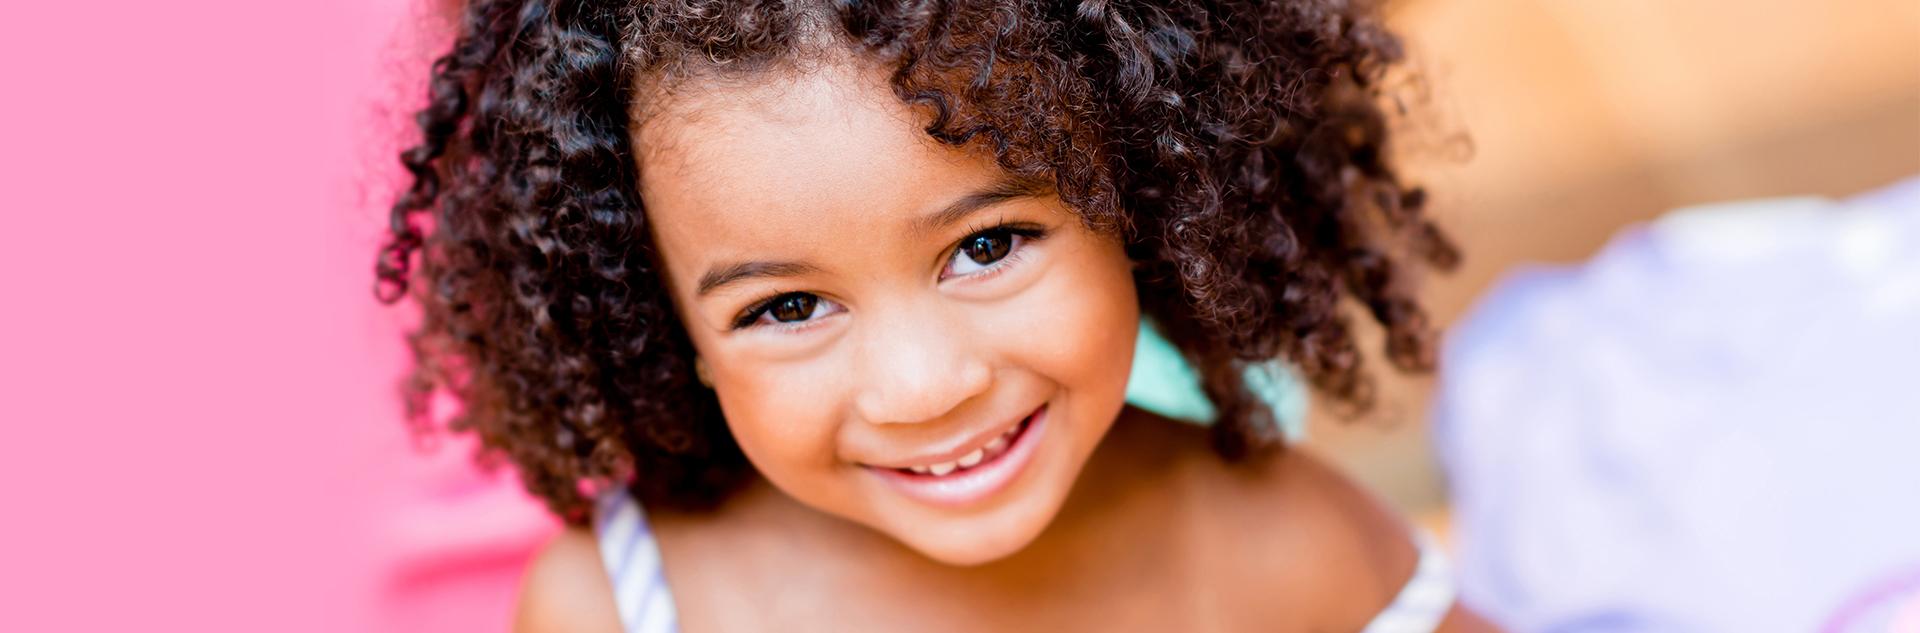 Pediatric Dental Appliances | columbus, Texas |